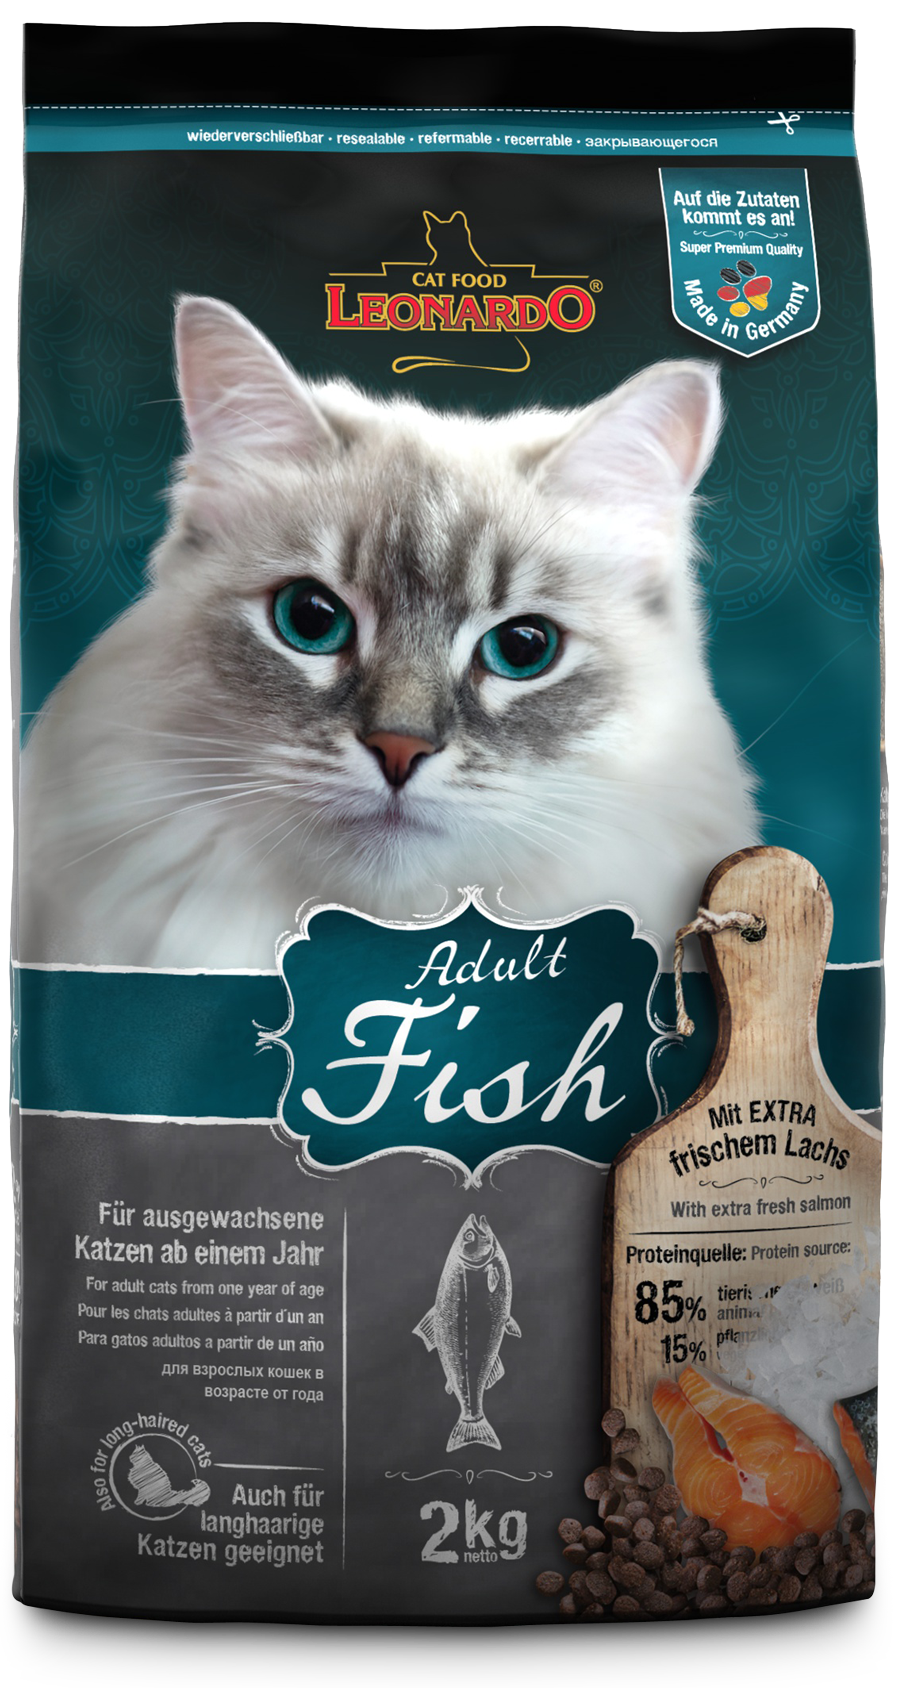 Leonardo-Adult-Fisch-2kg-front